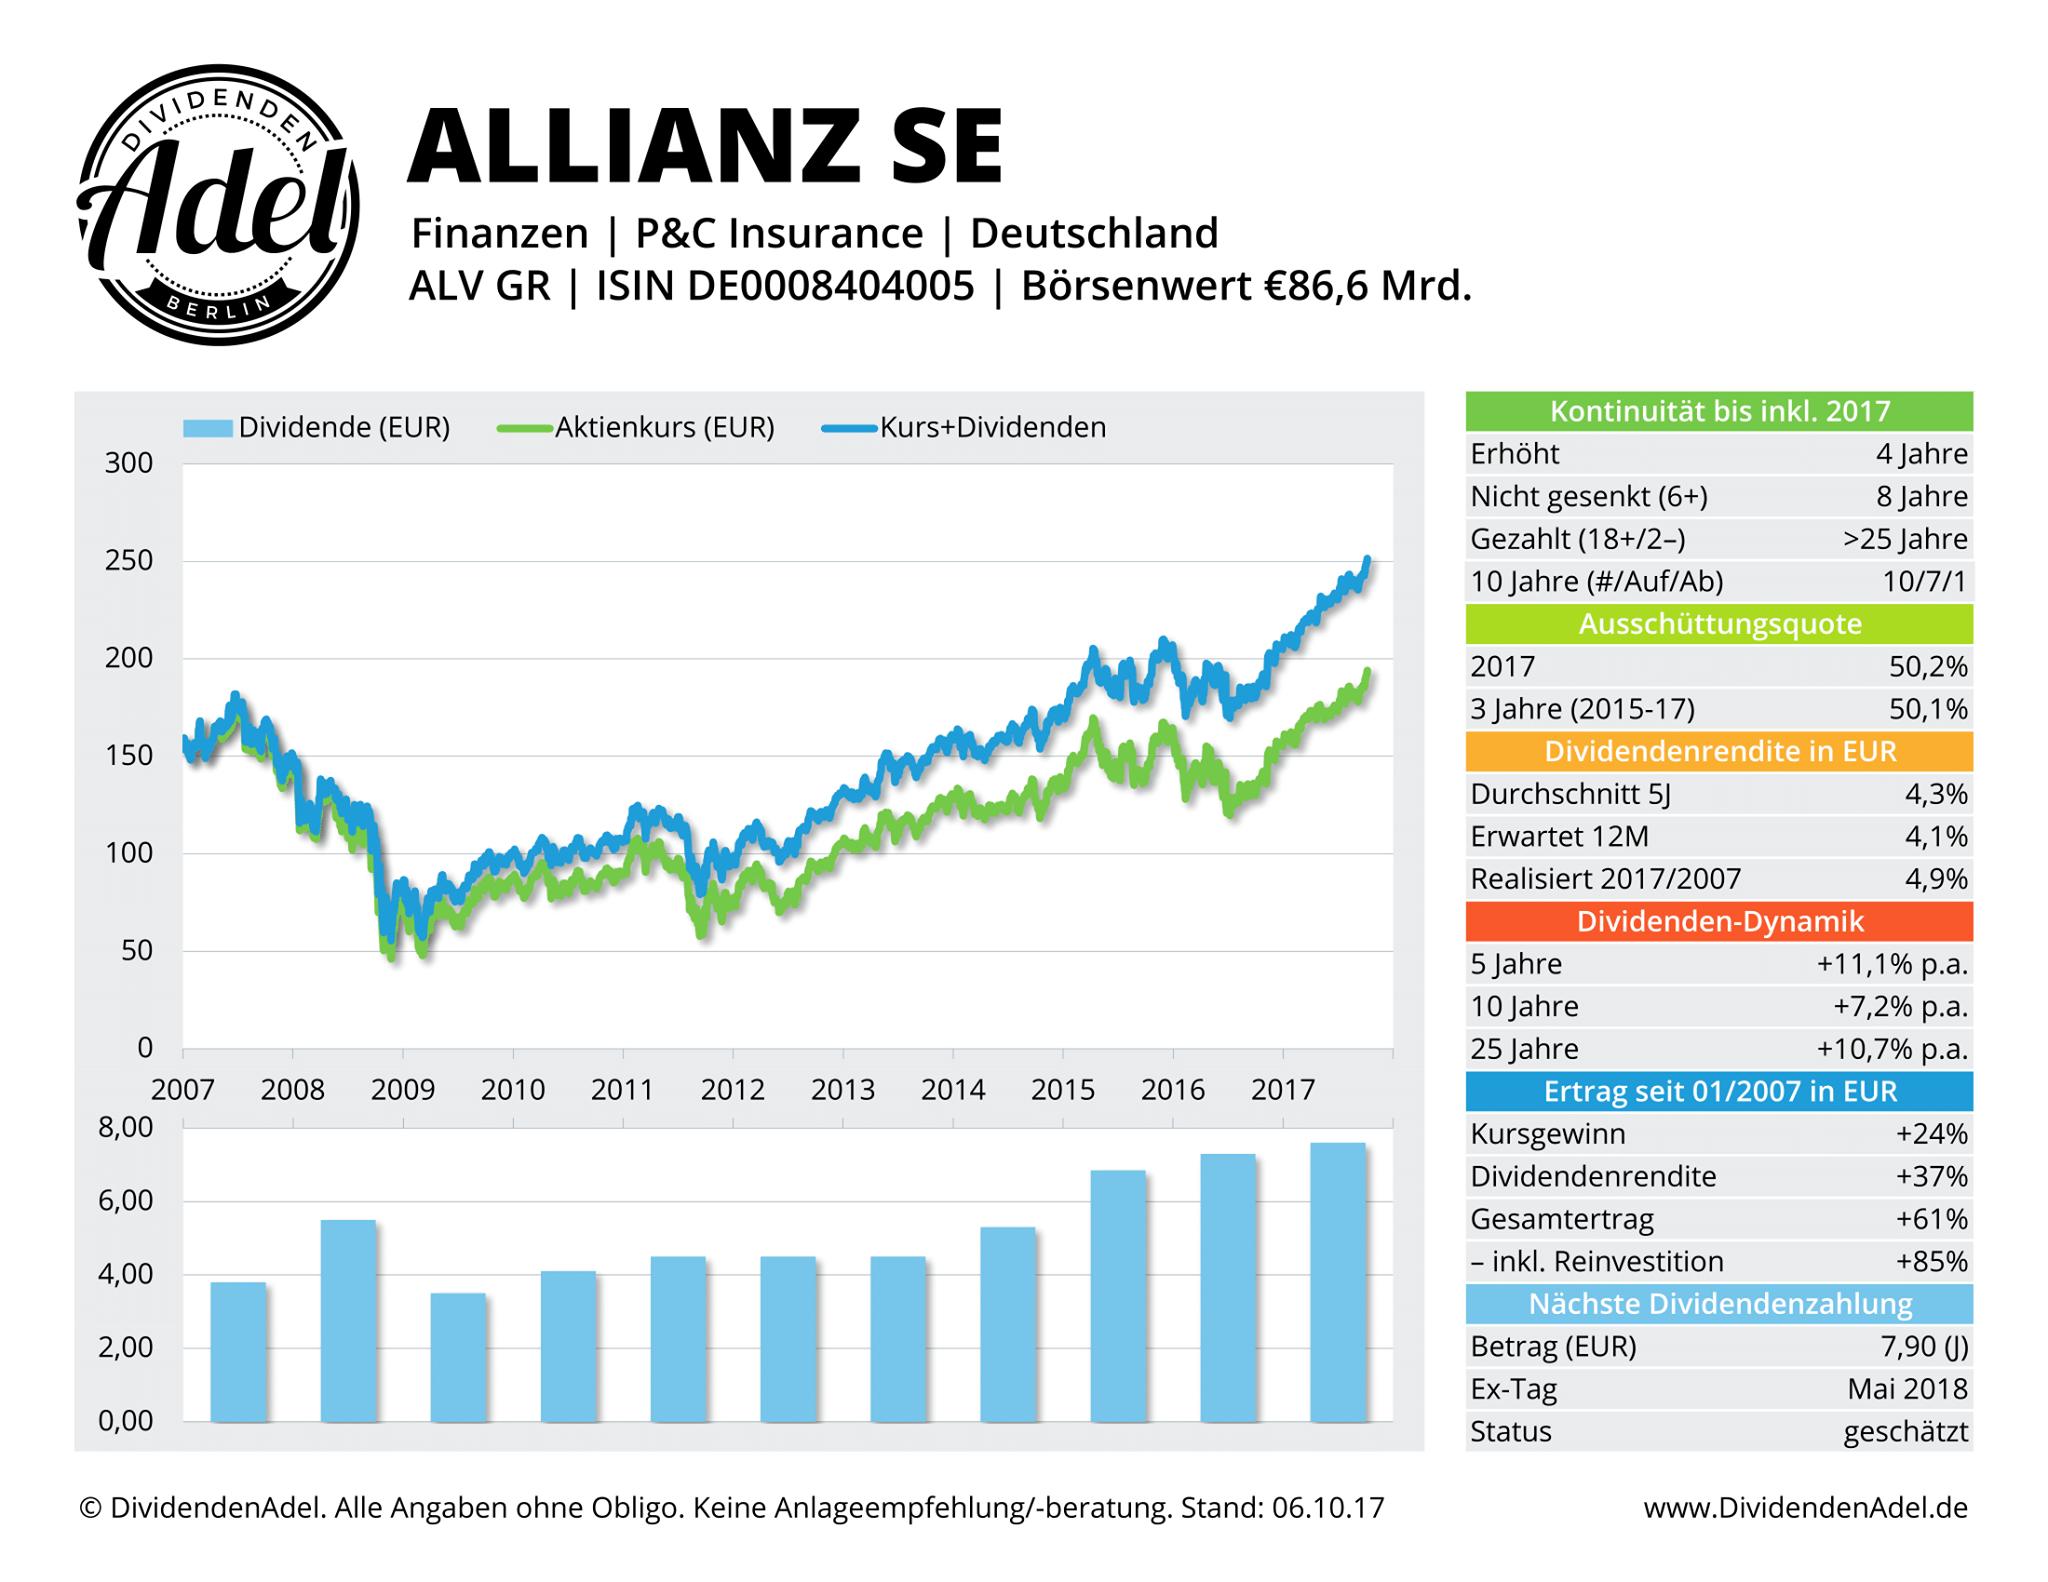 DividendenAdel-Profil-Allianz